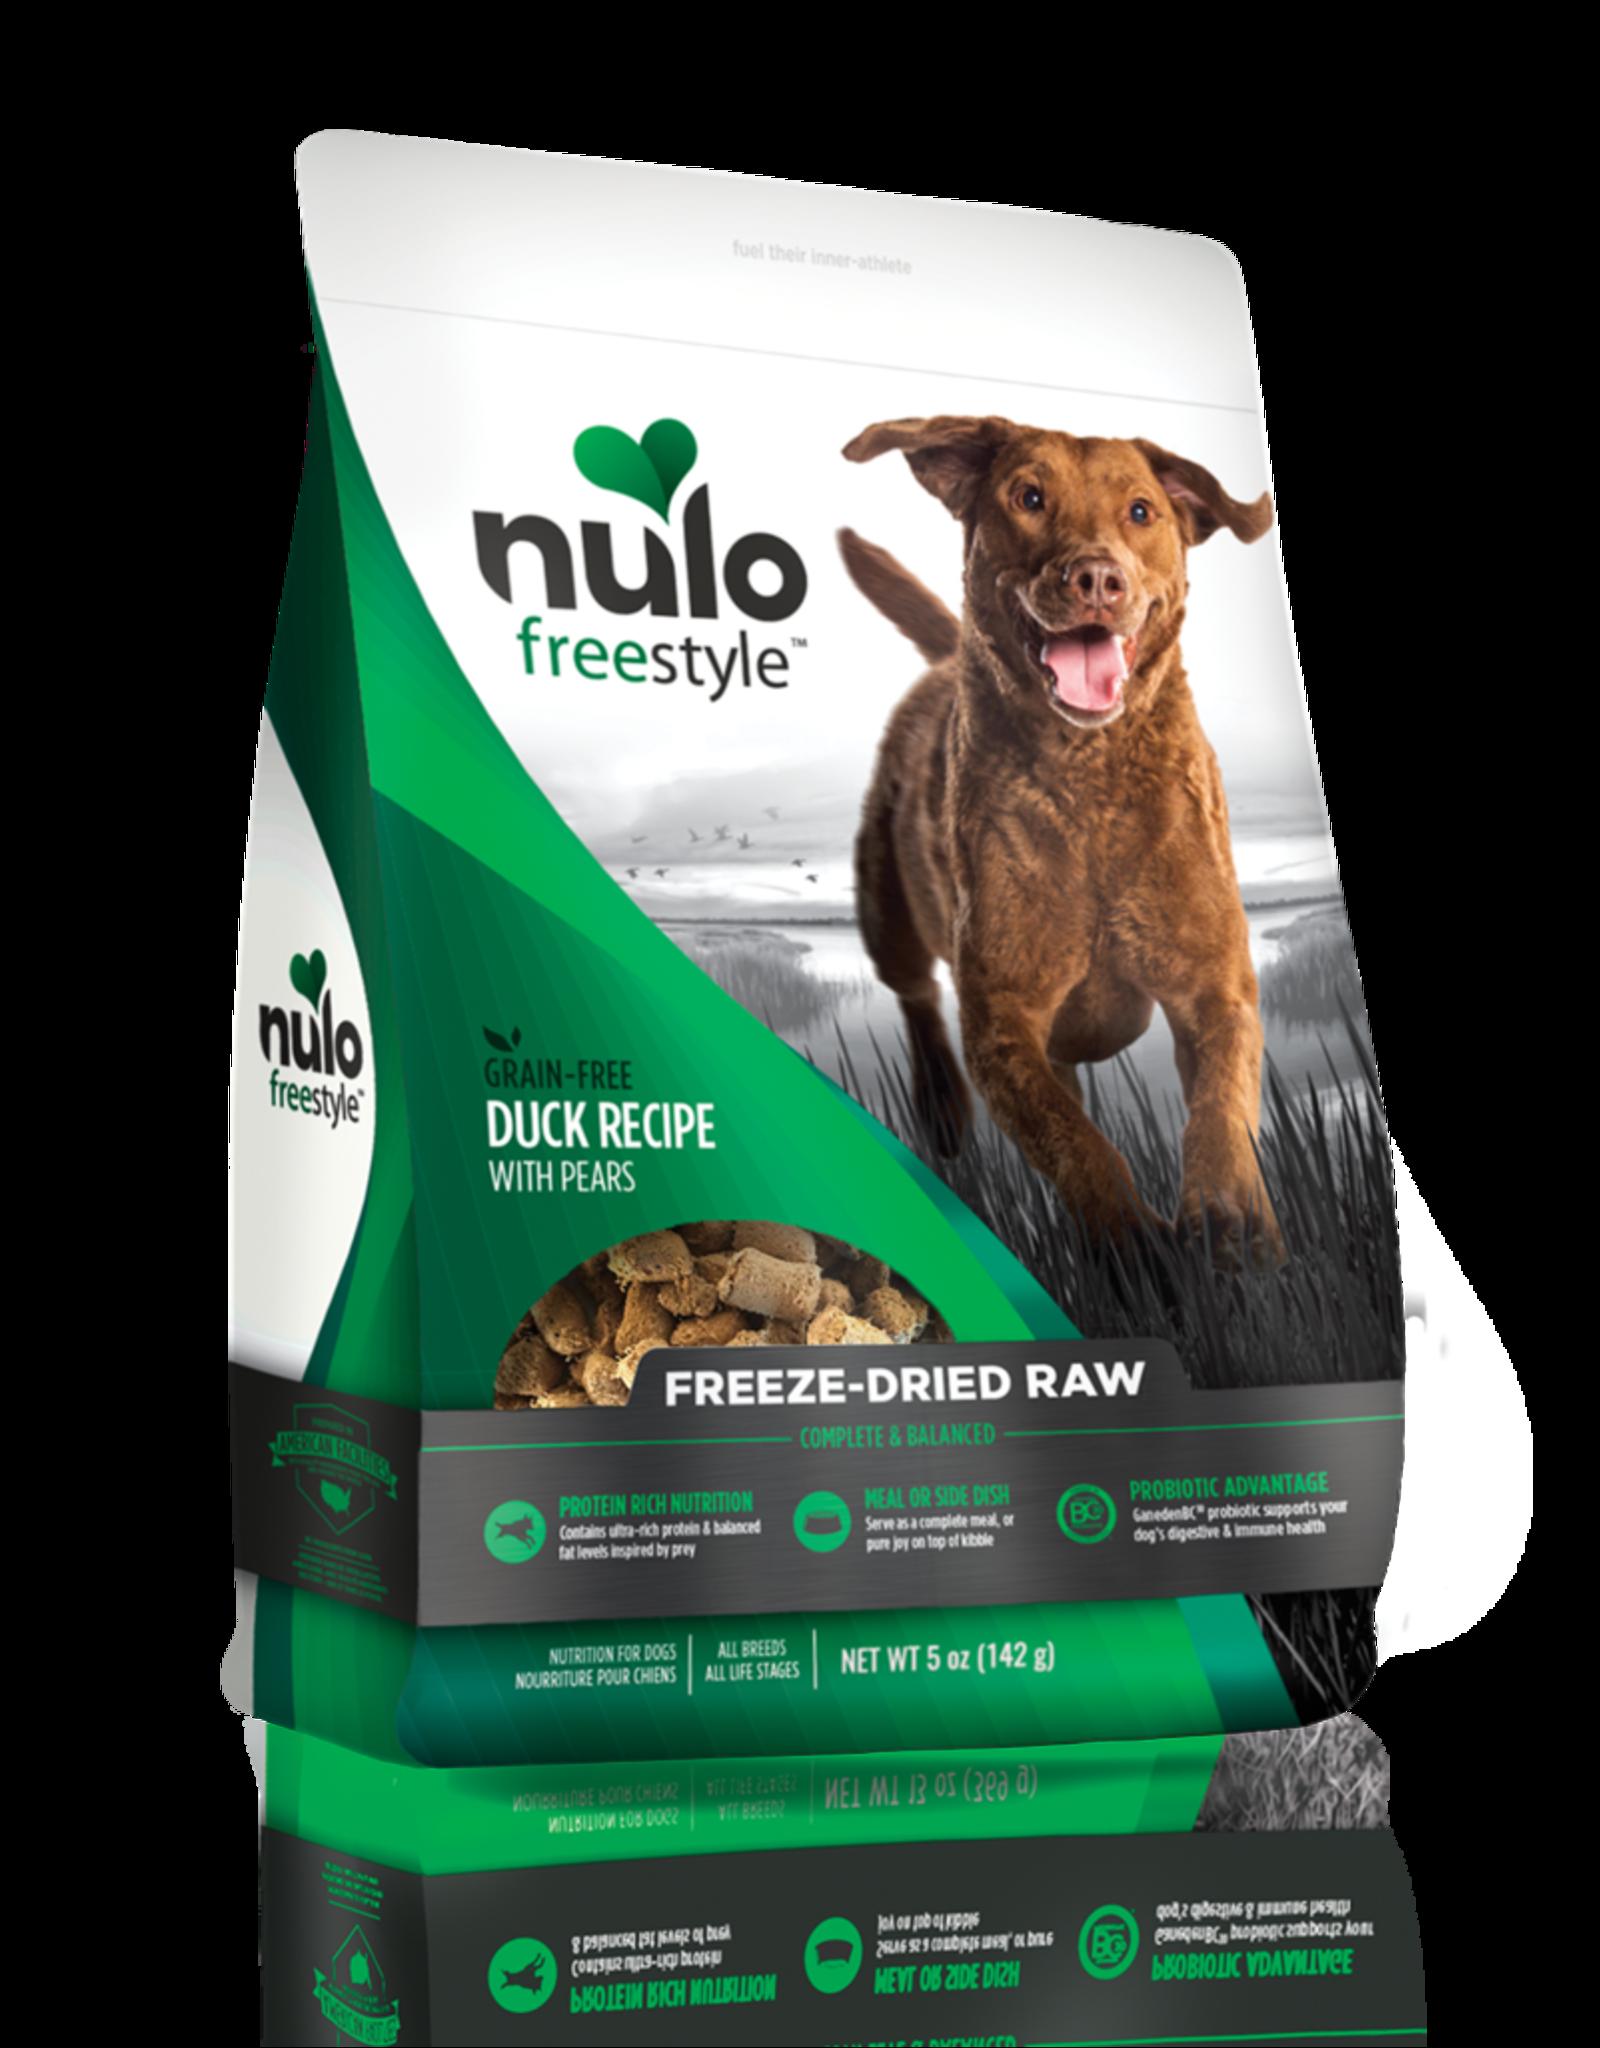 Nulo Freestyle Freeze-Dried Raw Duck w/ Pears